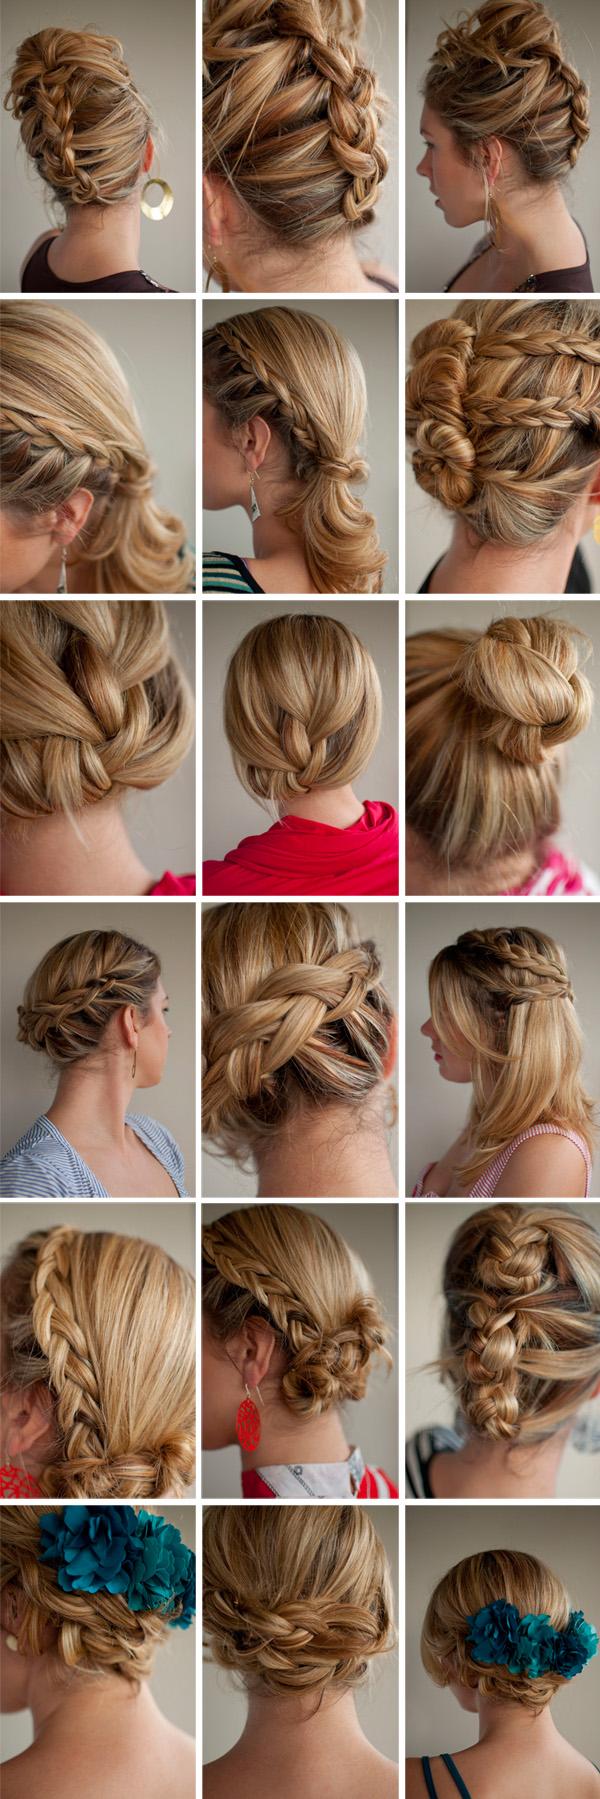 New Hair Romance Hairstyle Challenge 30 Braids In 30 Days Hair